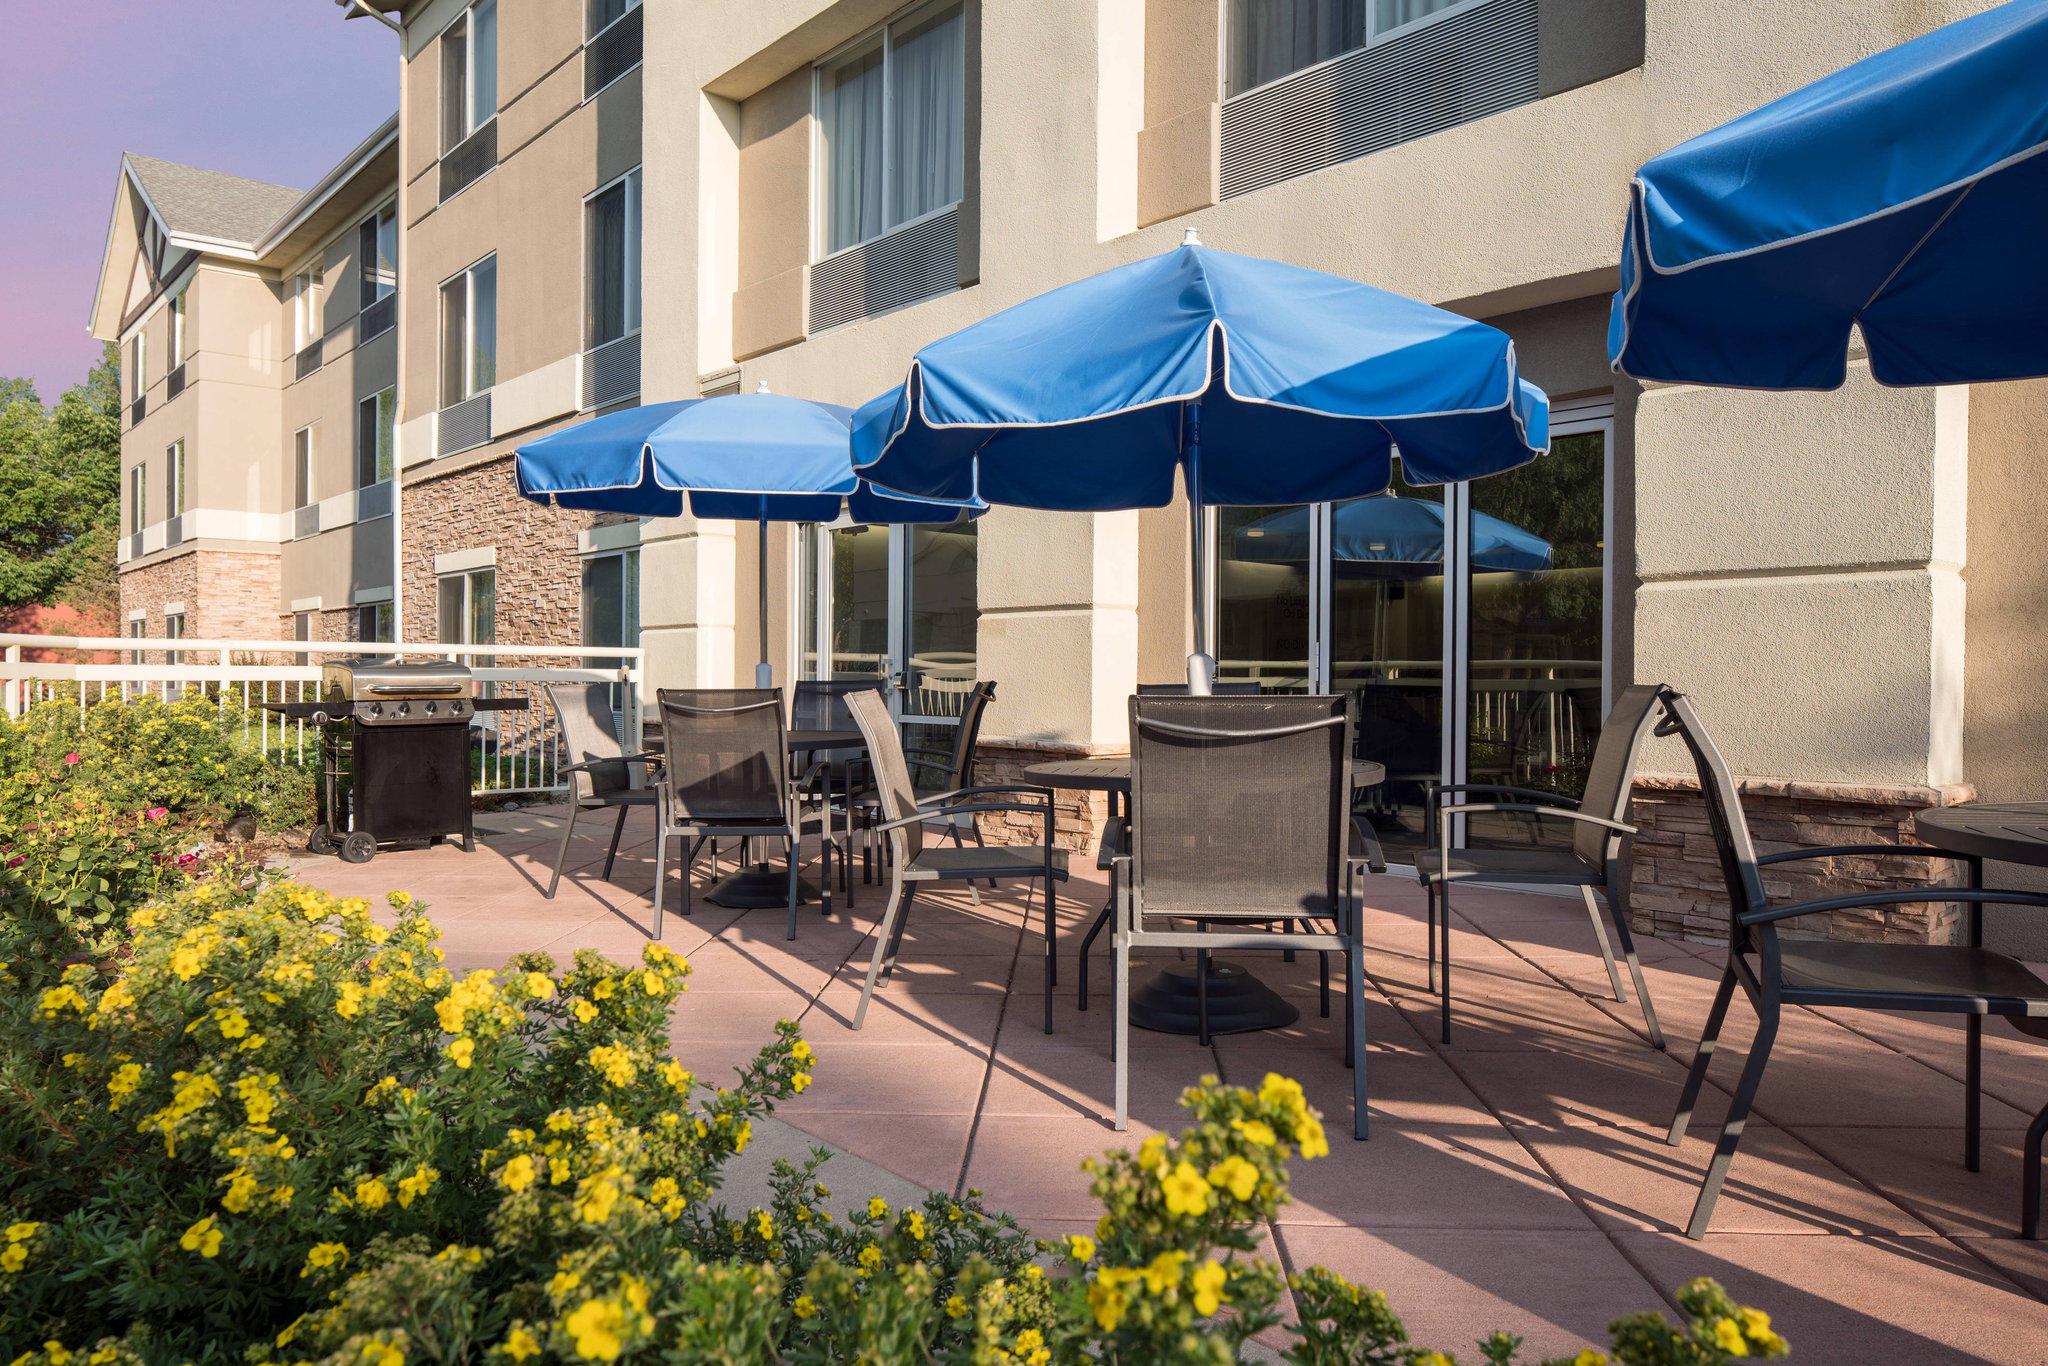 Fairfield Inn & Suites by Marriott Loveland Fort Collins